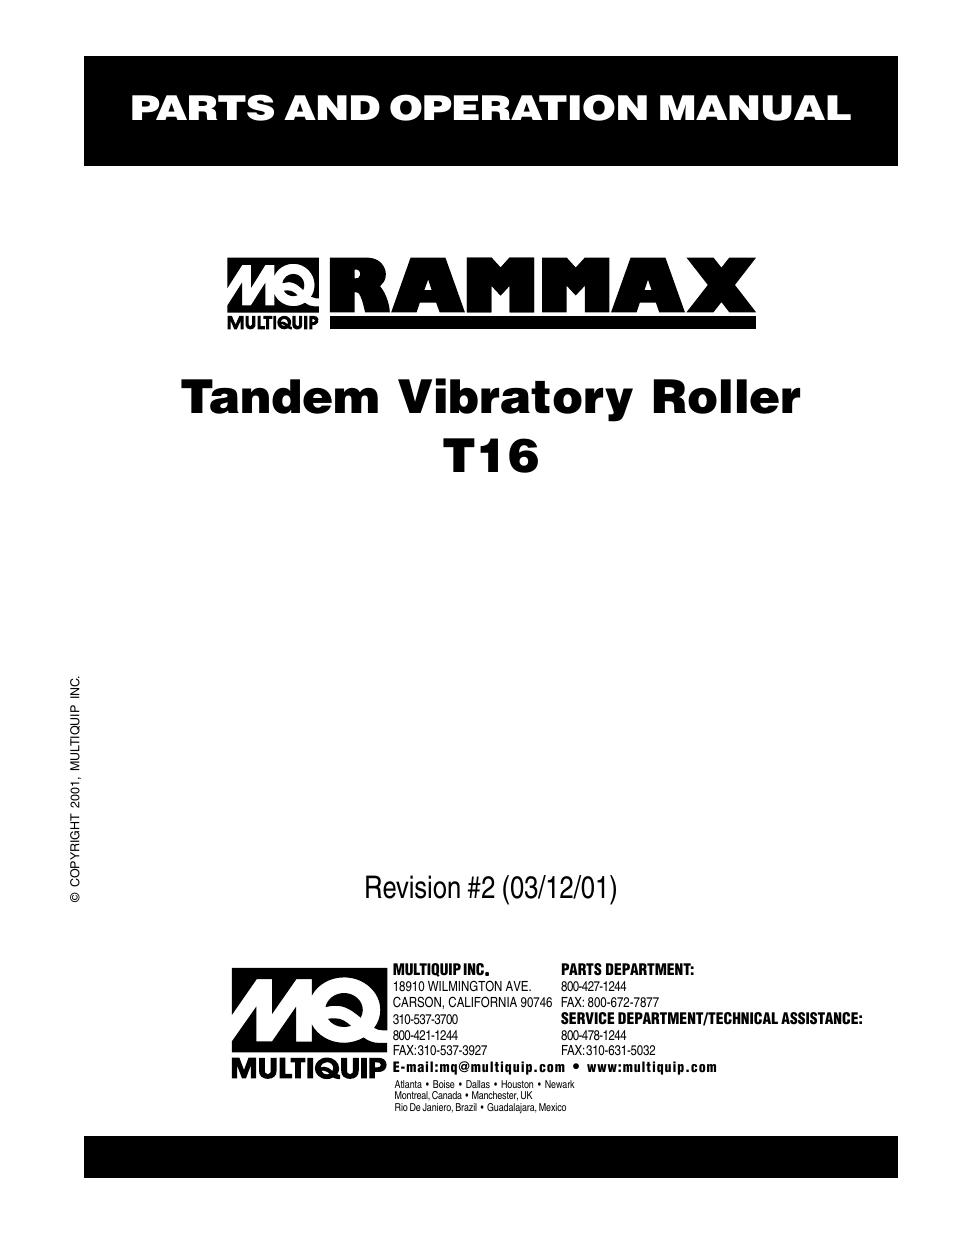 Multiquip Rammax Tandem Vibratory Roller T16 User Manual